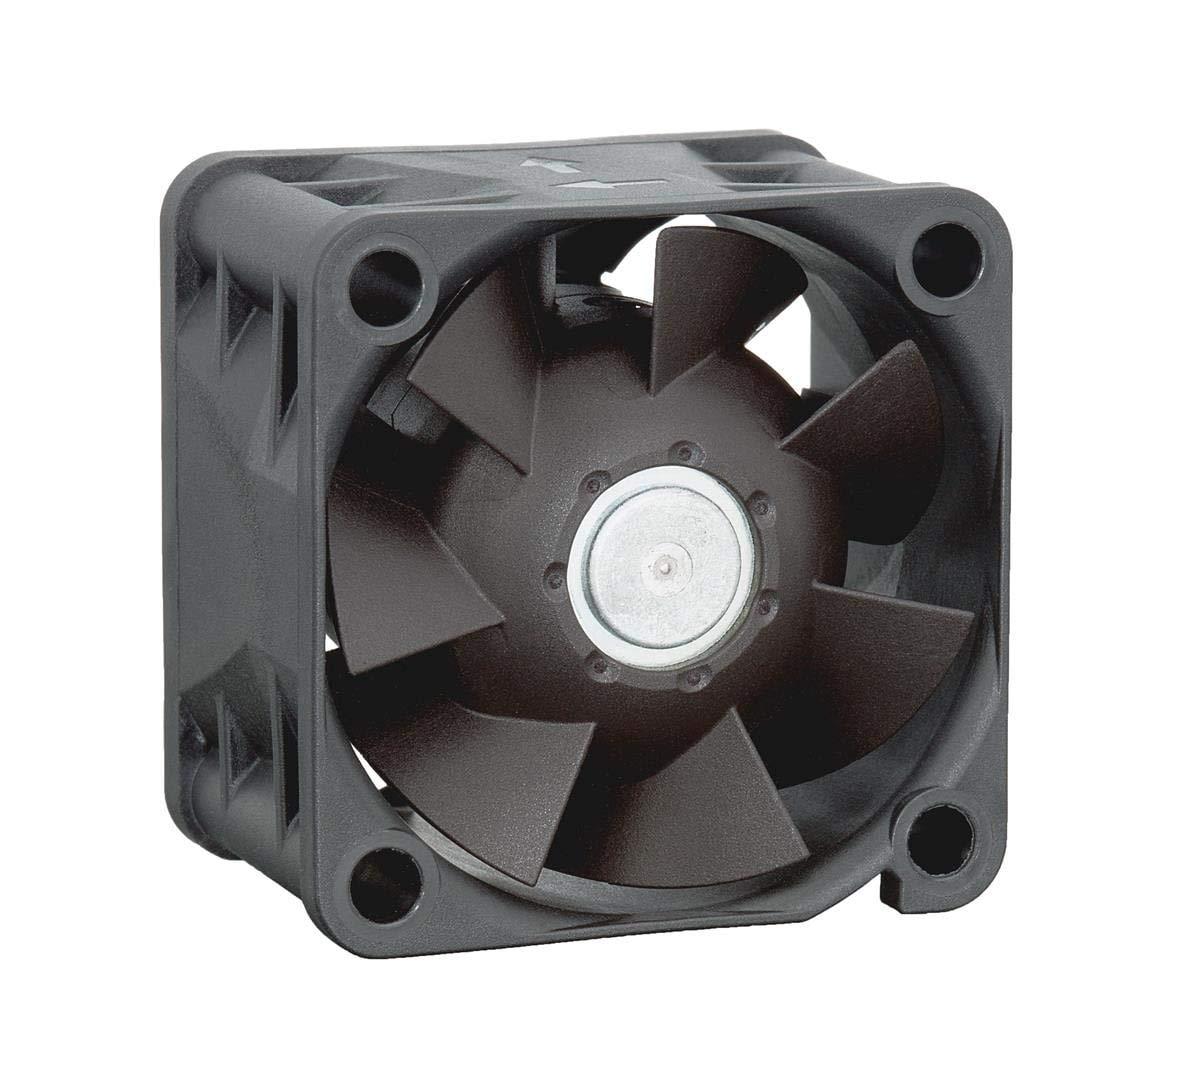 Axial Fan 420J Series Many popular brands 12 V DC 18.3 Ranking TOP2 cu. mm 28 48 40 dBA